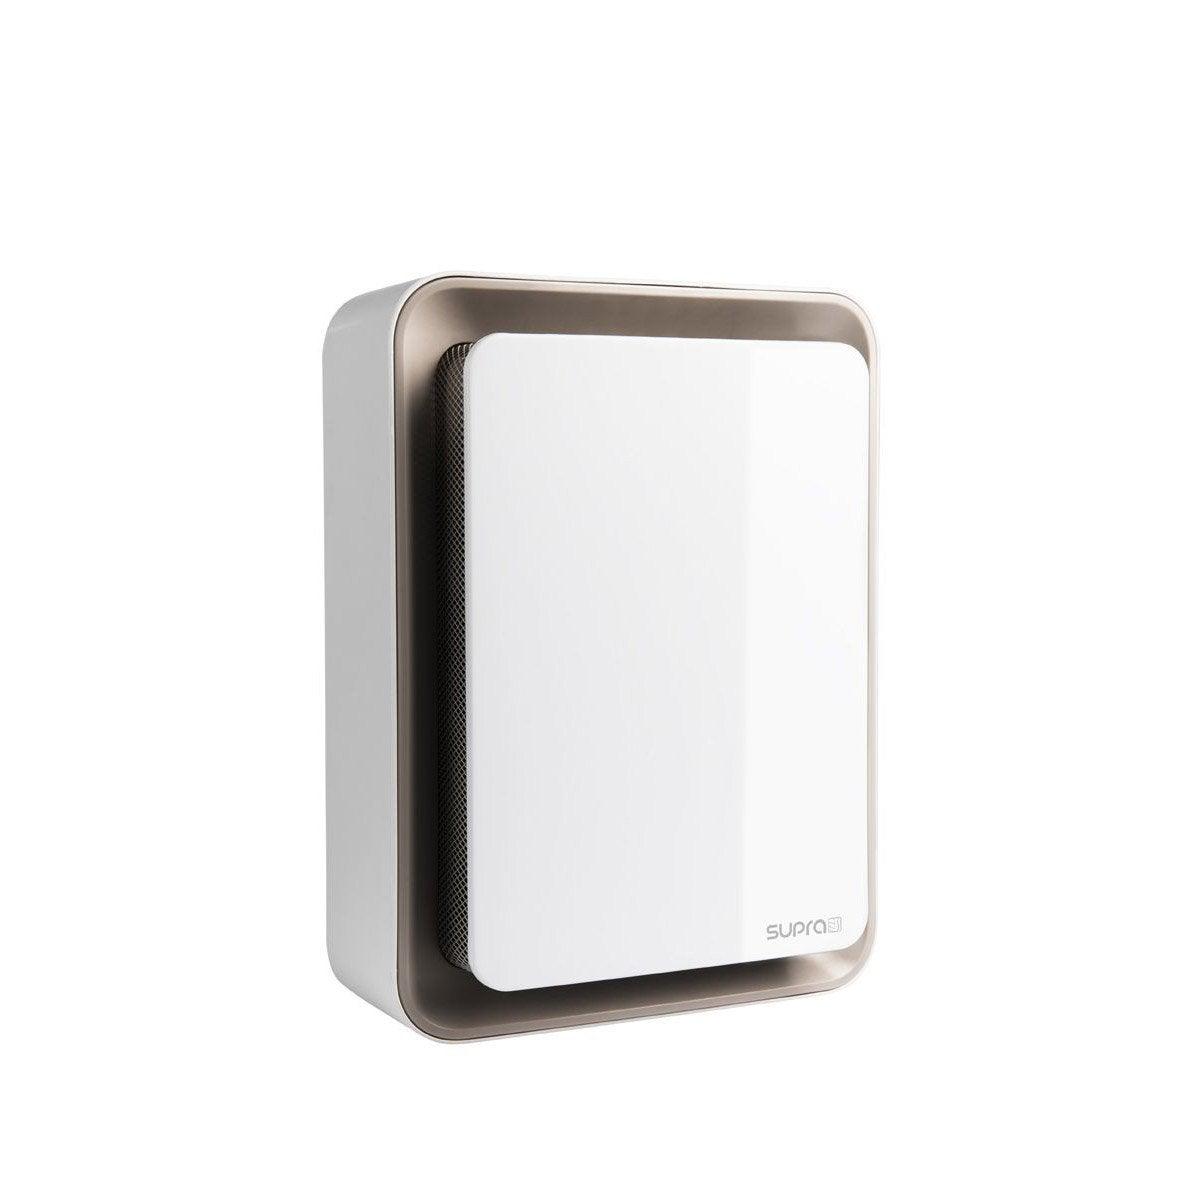 Deco cuisine moderne petite for Radiateur soufflant salle de bain supra